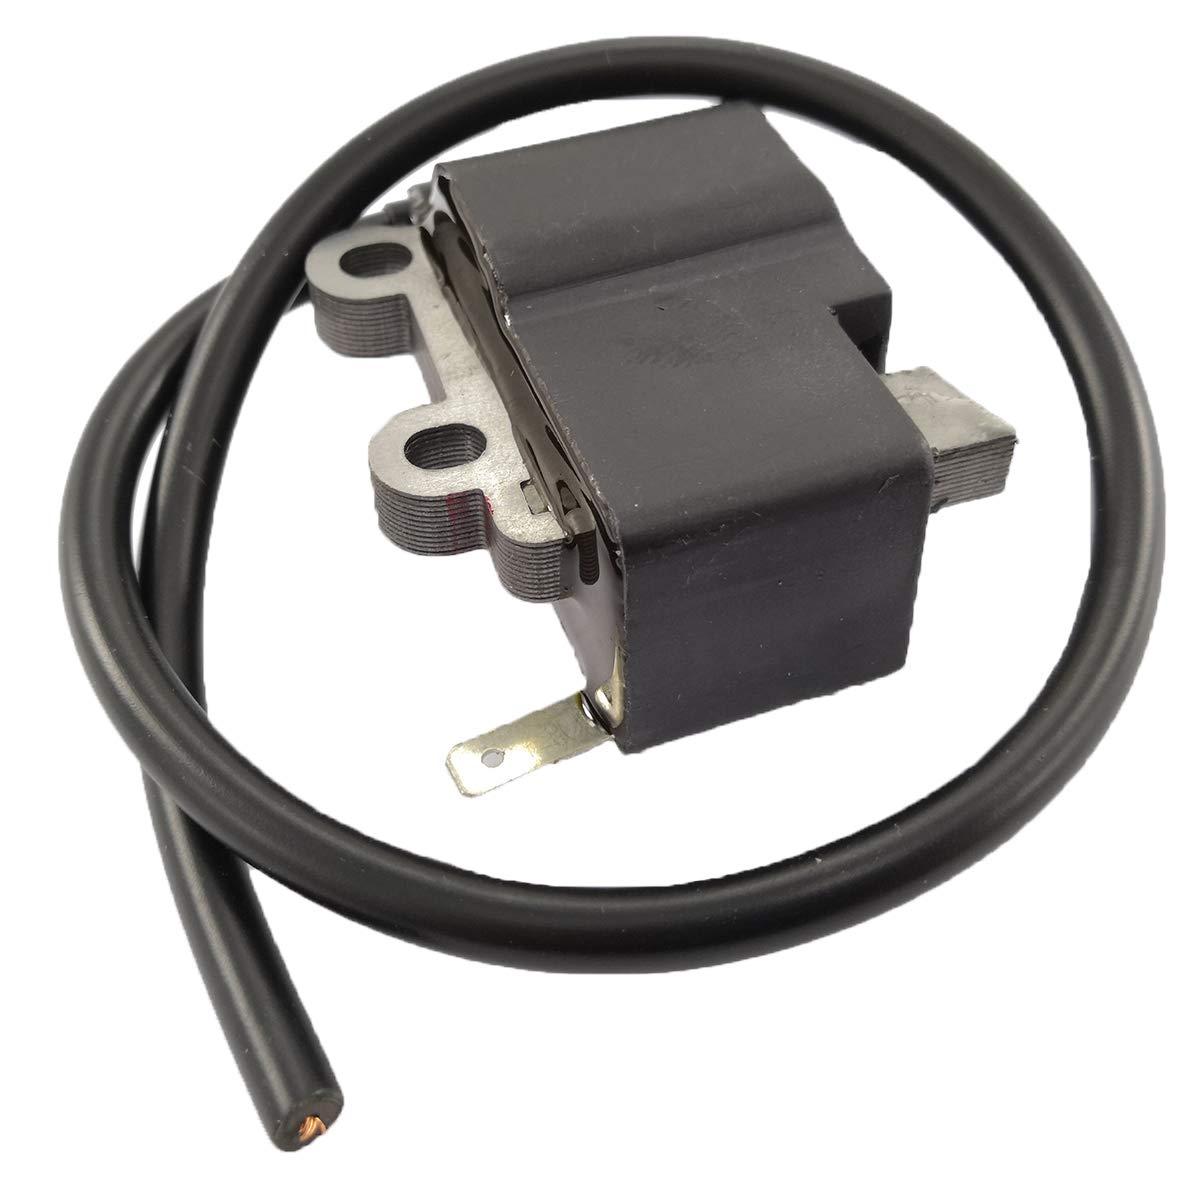 LA-TAT Ignition Coil for Echo # A411000420 PB-500 PB-500H PB-500T S/N